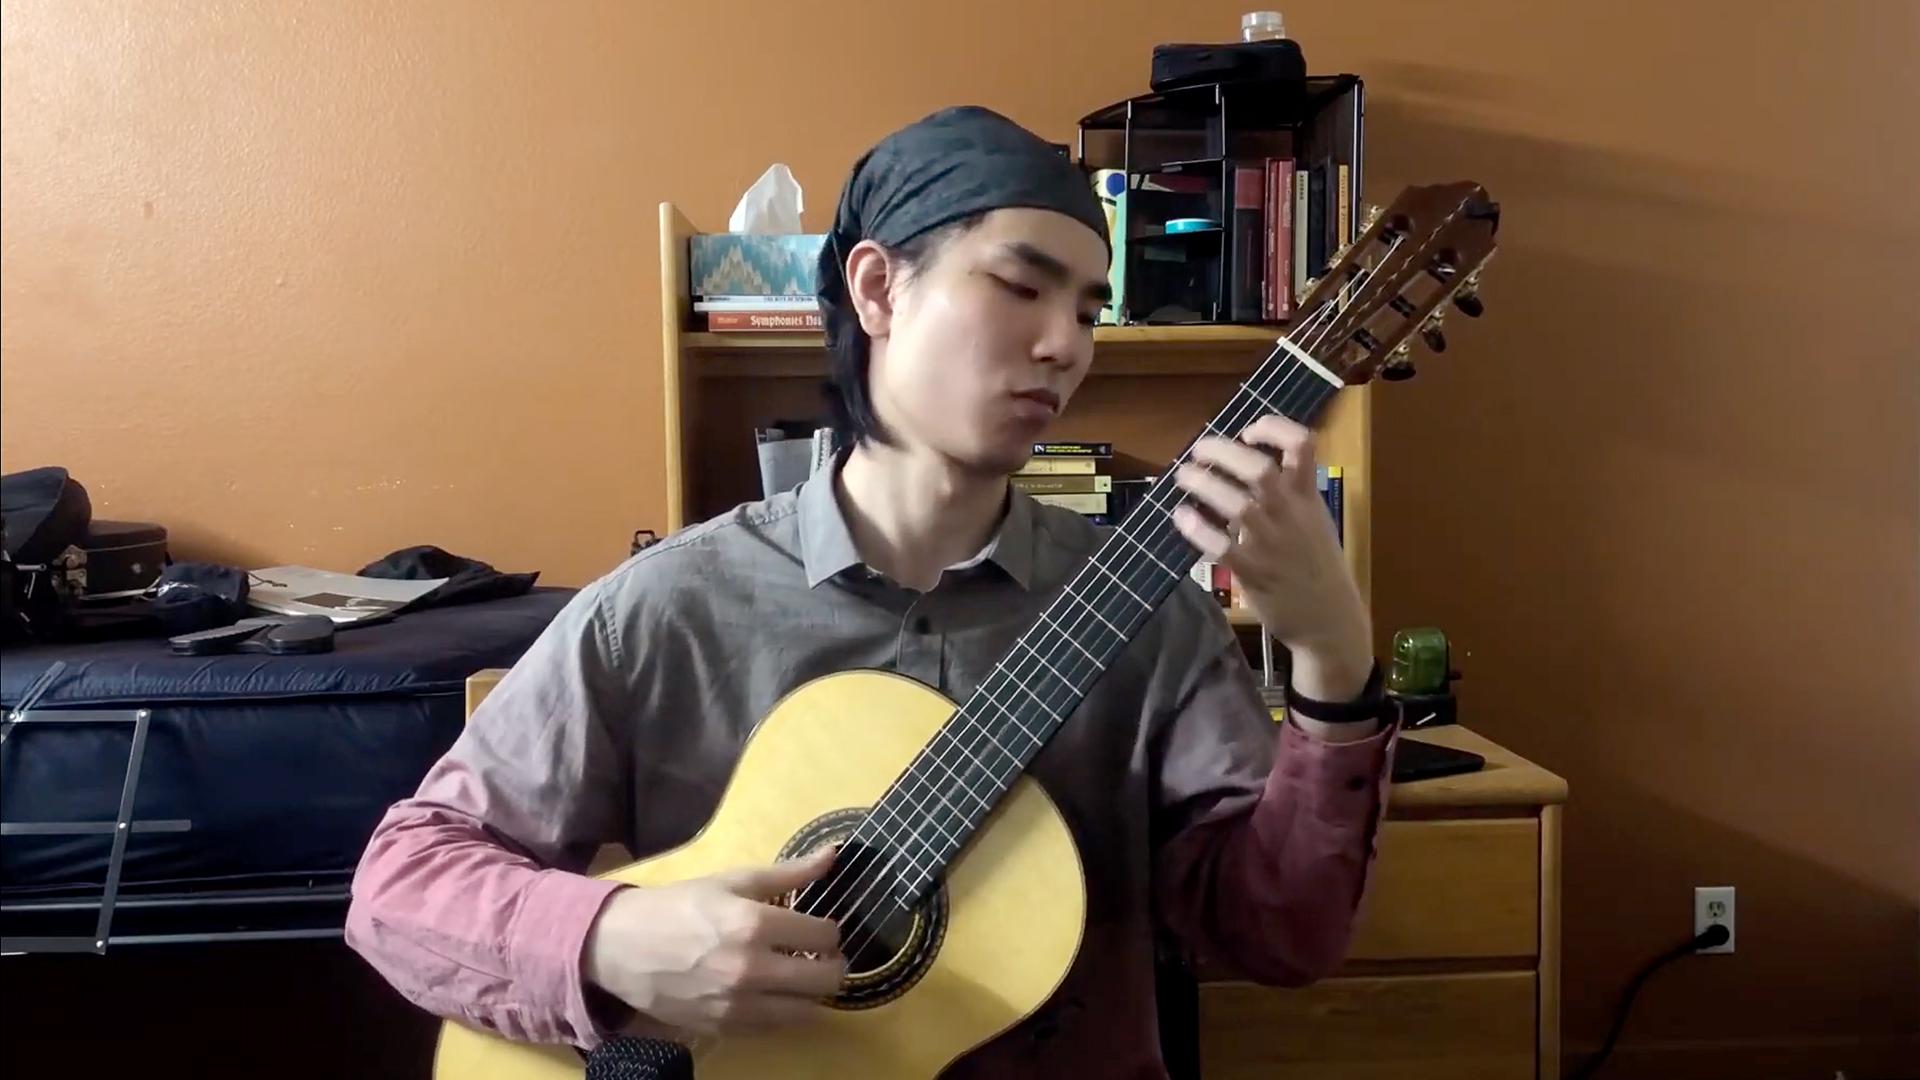 Robert Wang wears a bandana and plays a classical guitar in a dorm room